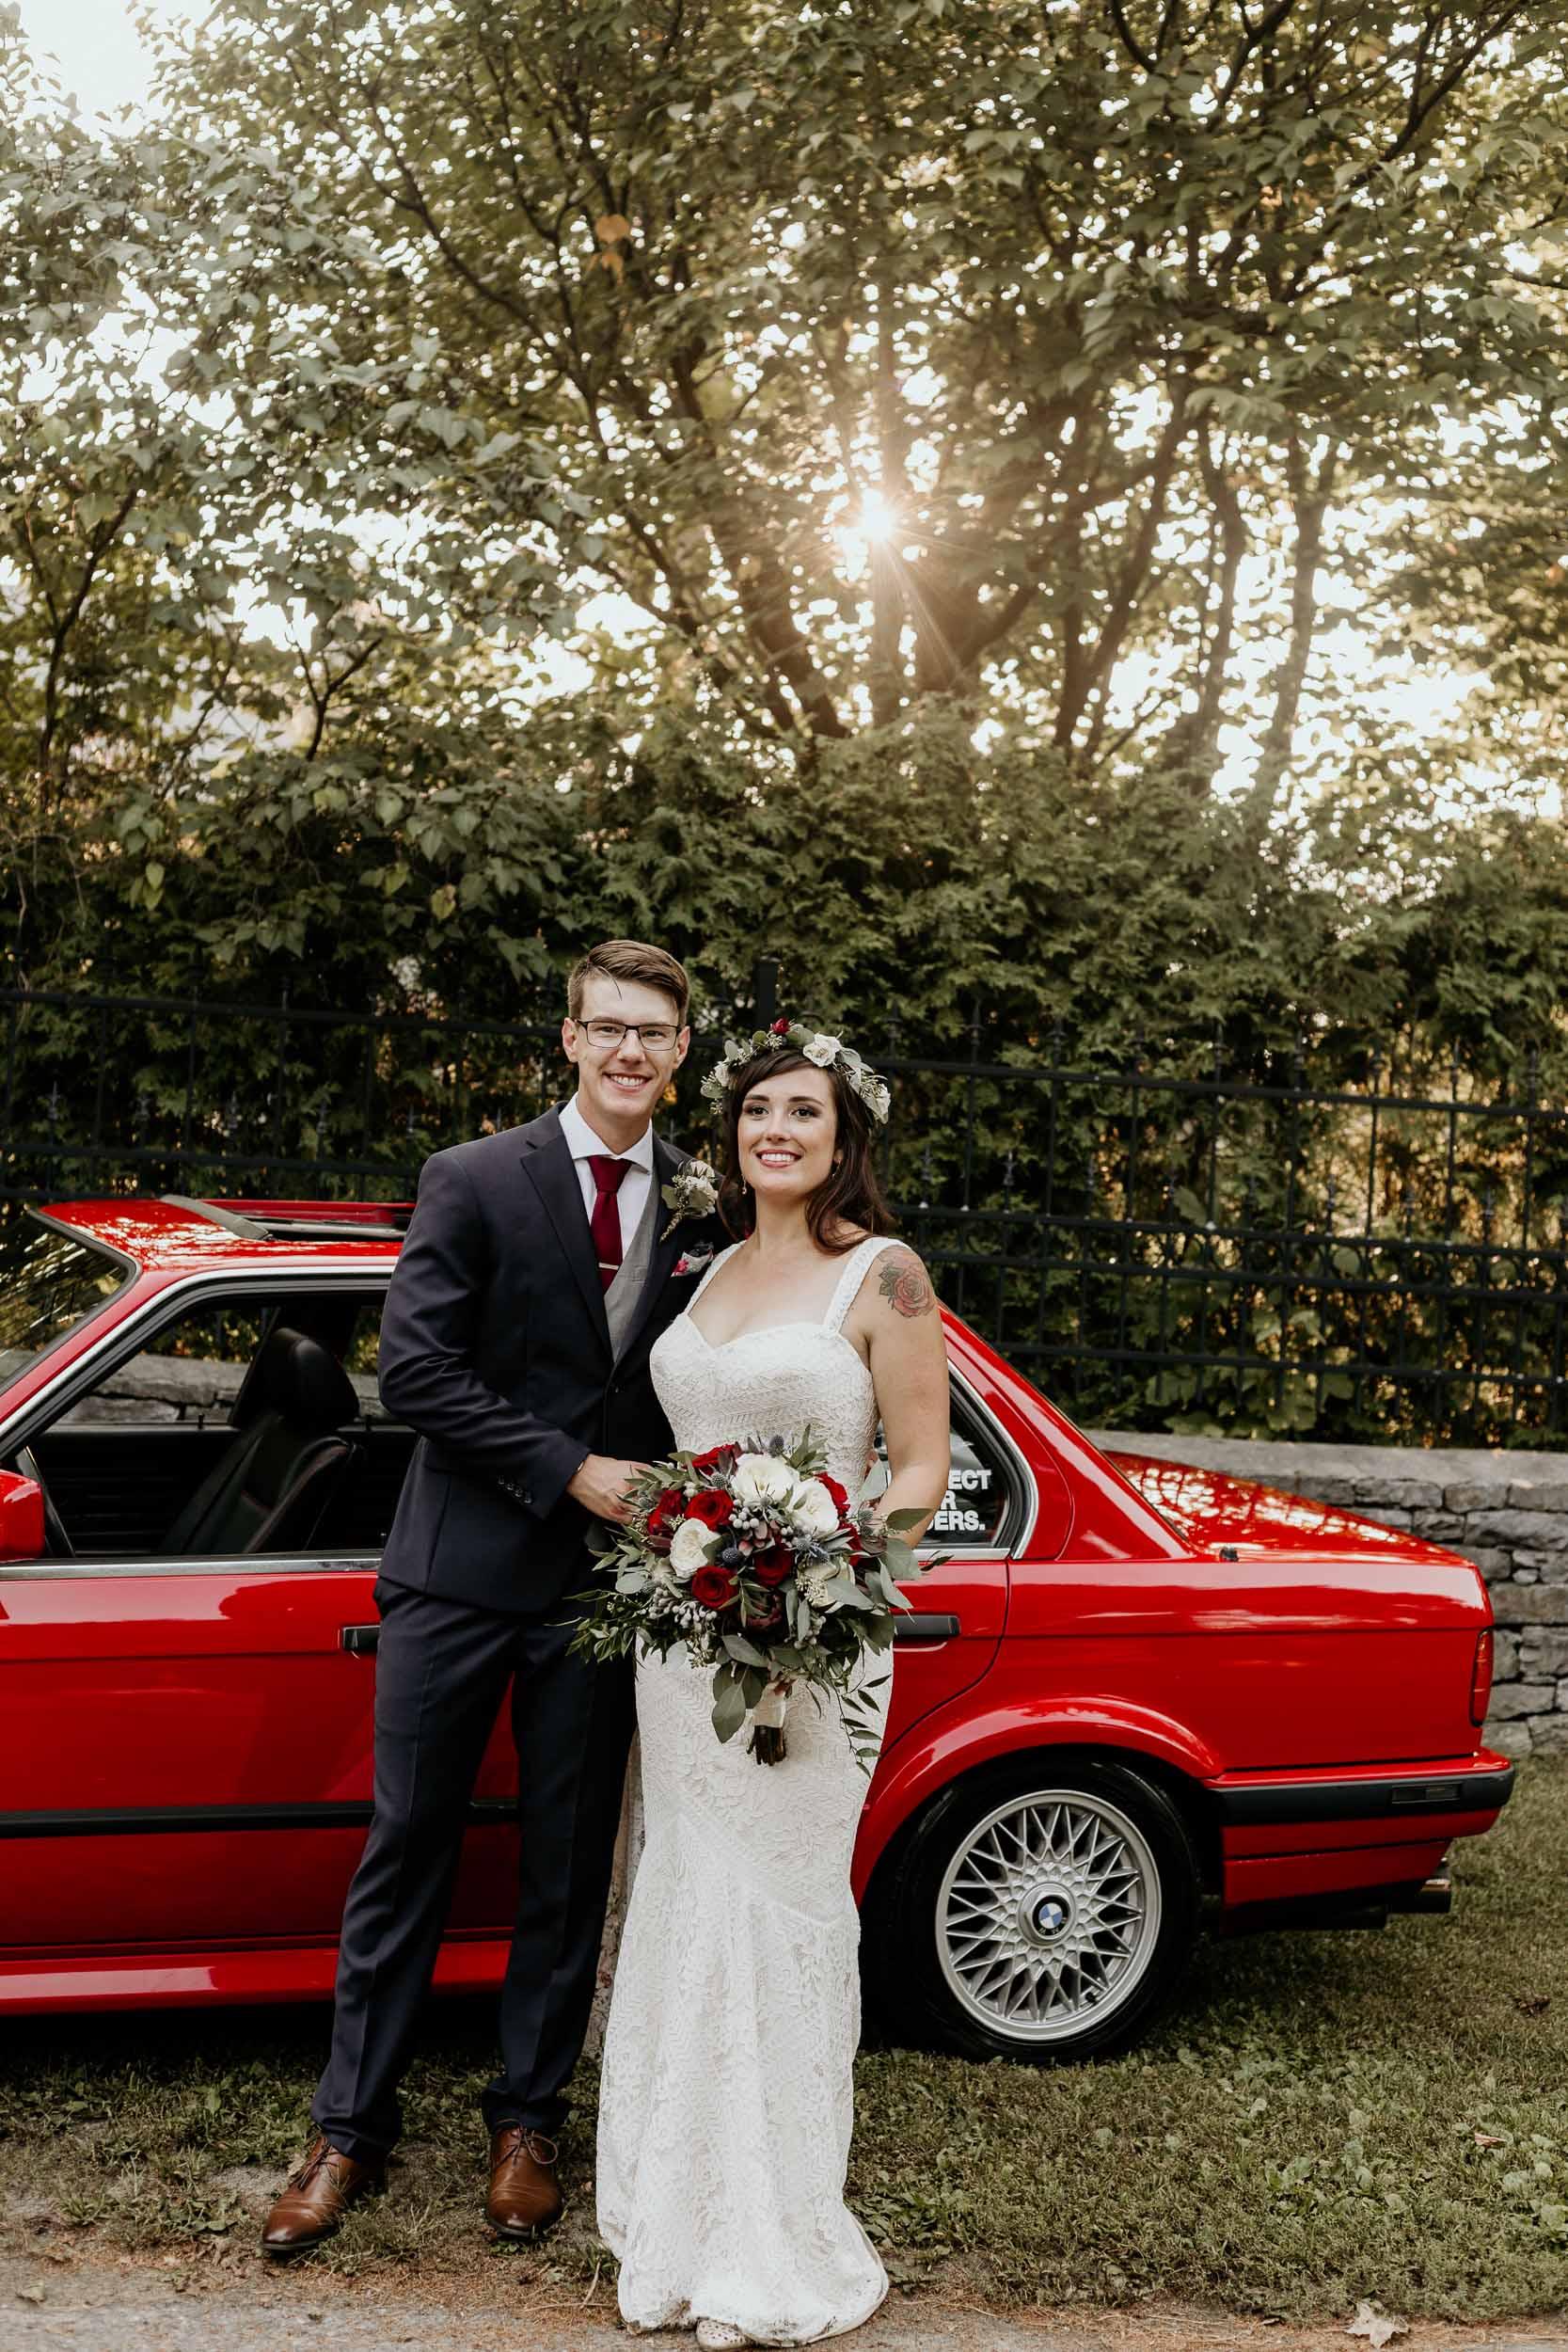 intimate-wedding-elopement-photographer-ottawa-toronto-8149.jpg